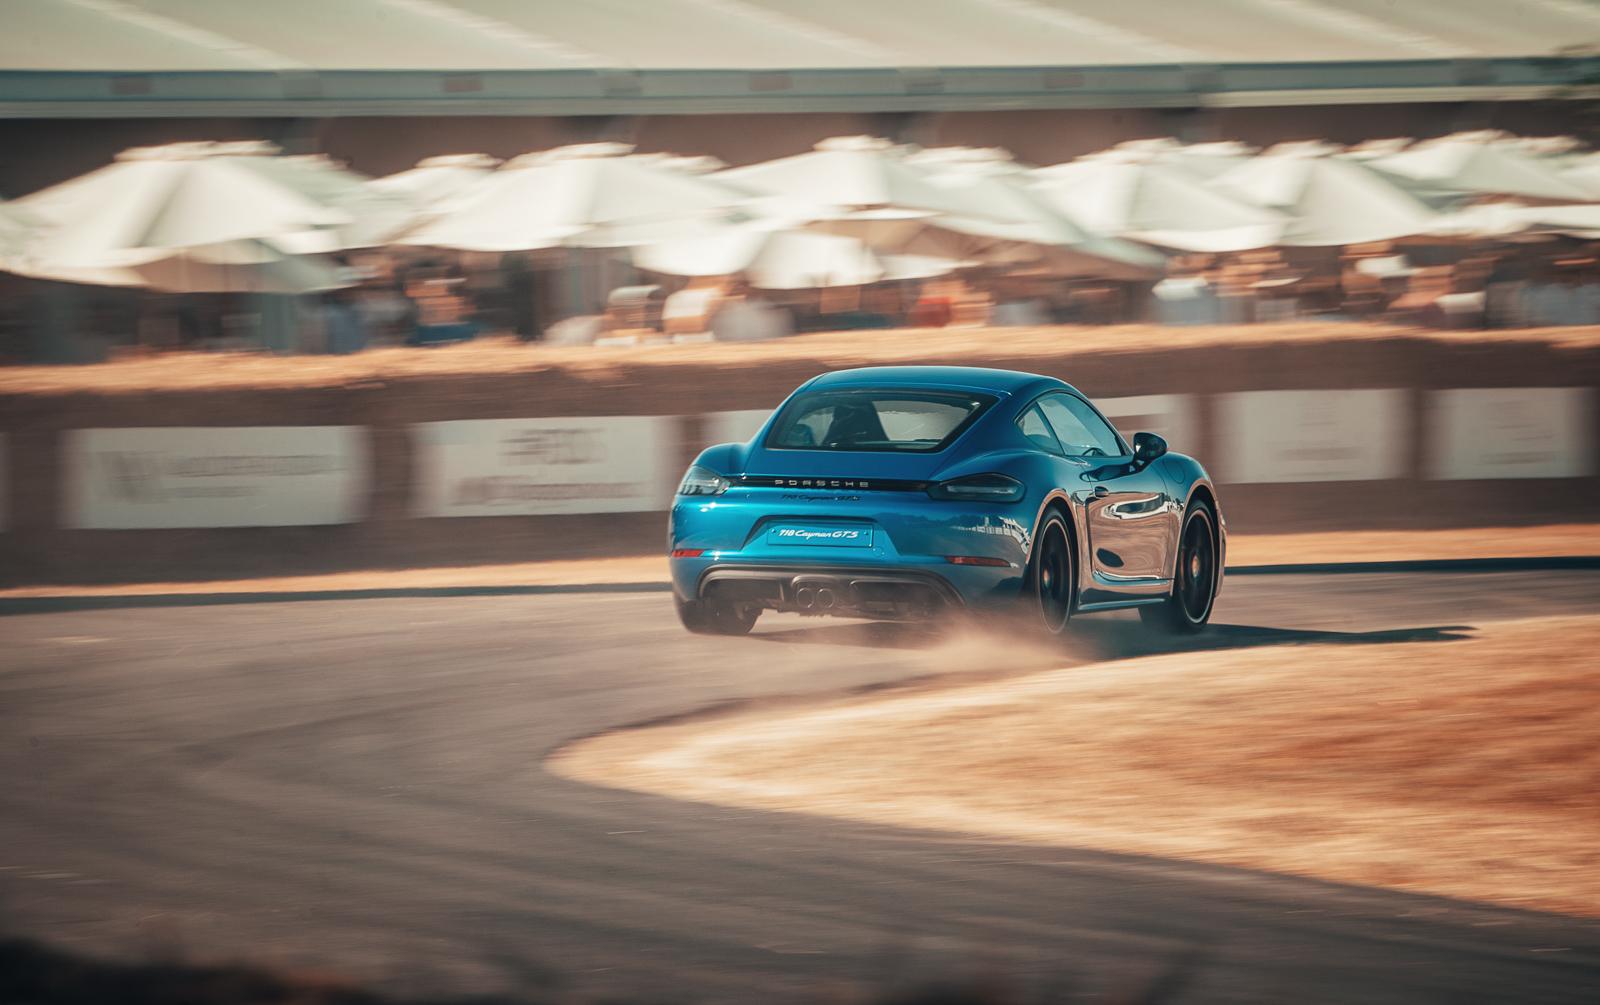 RP - Porsche Goodwood Fesitval of Speed 70 Years 2018-139.jpg